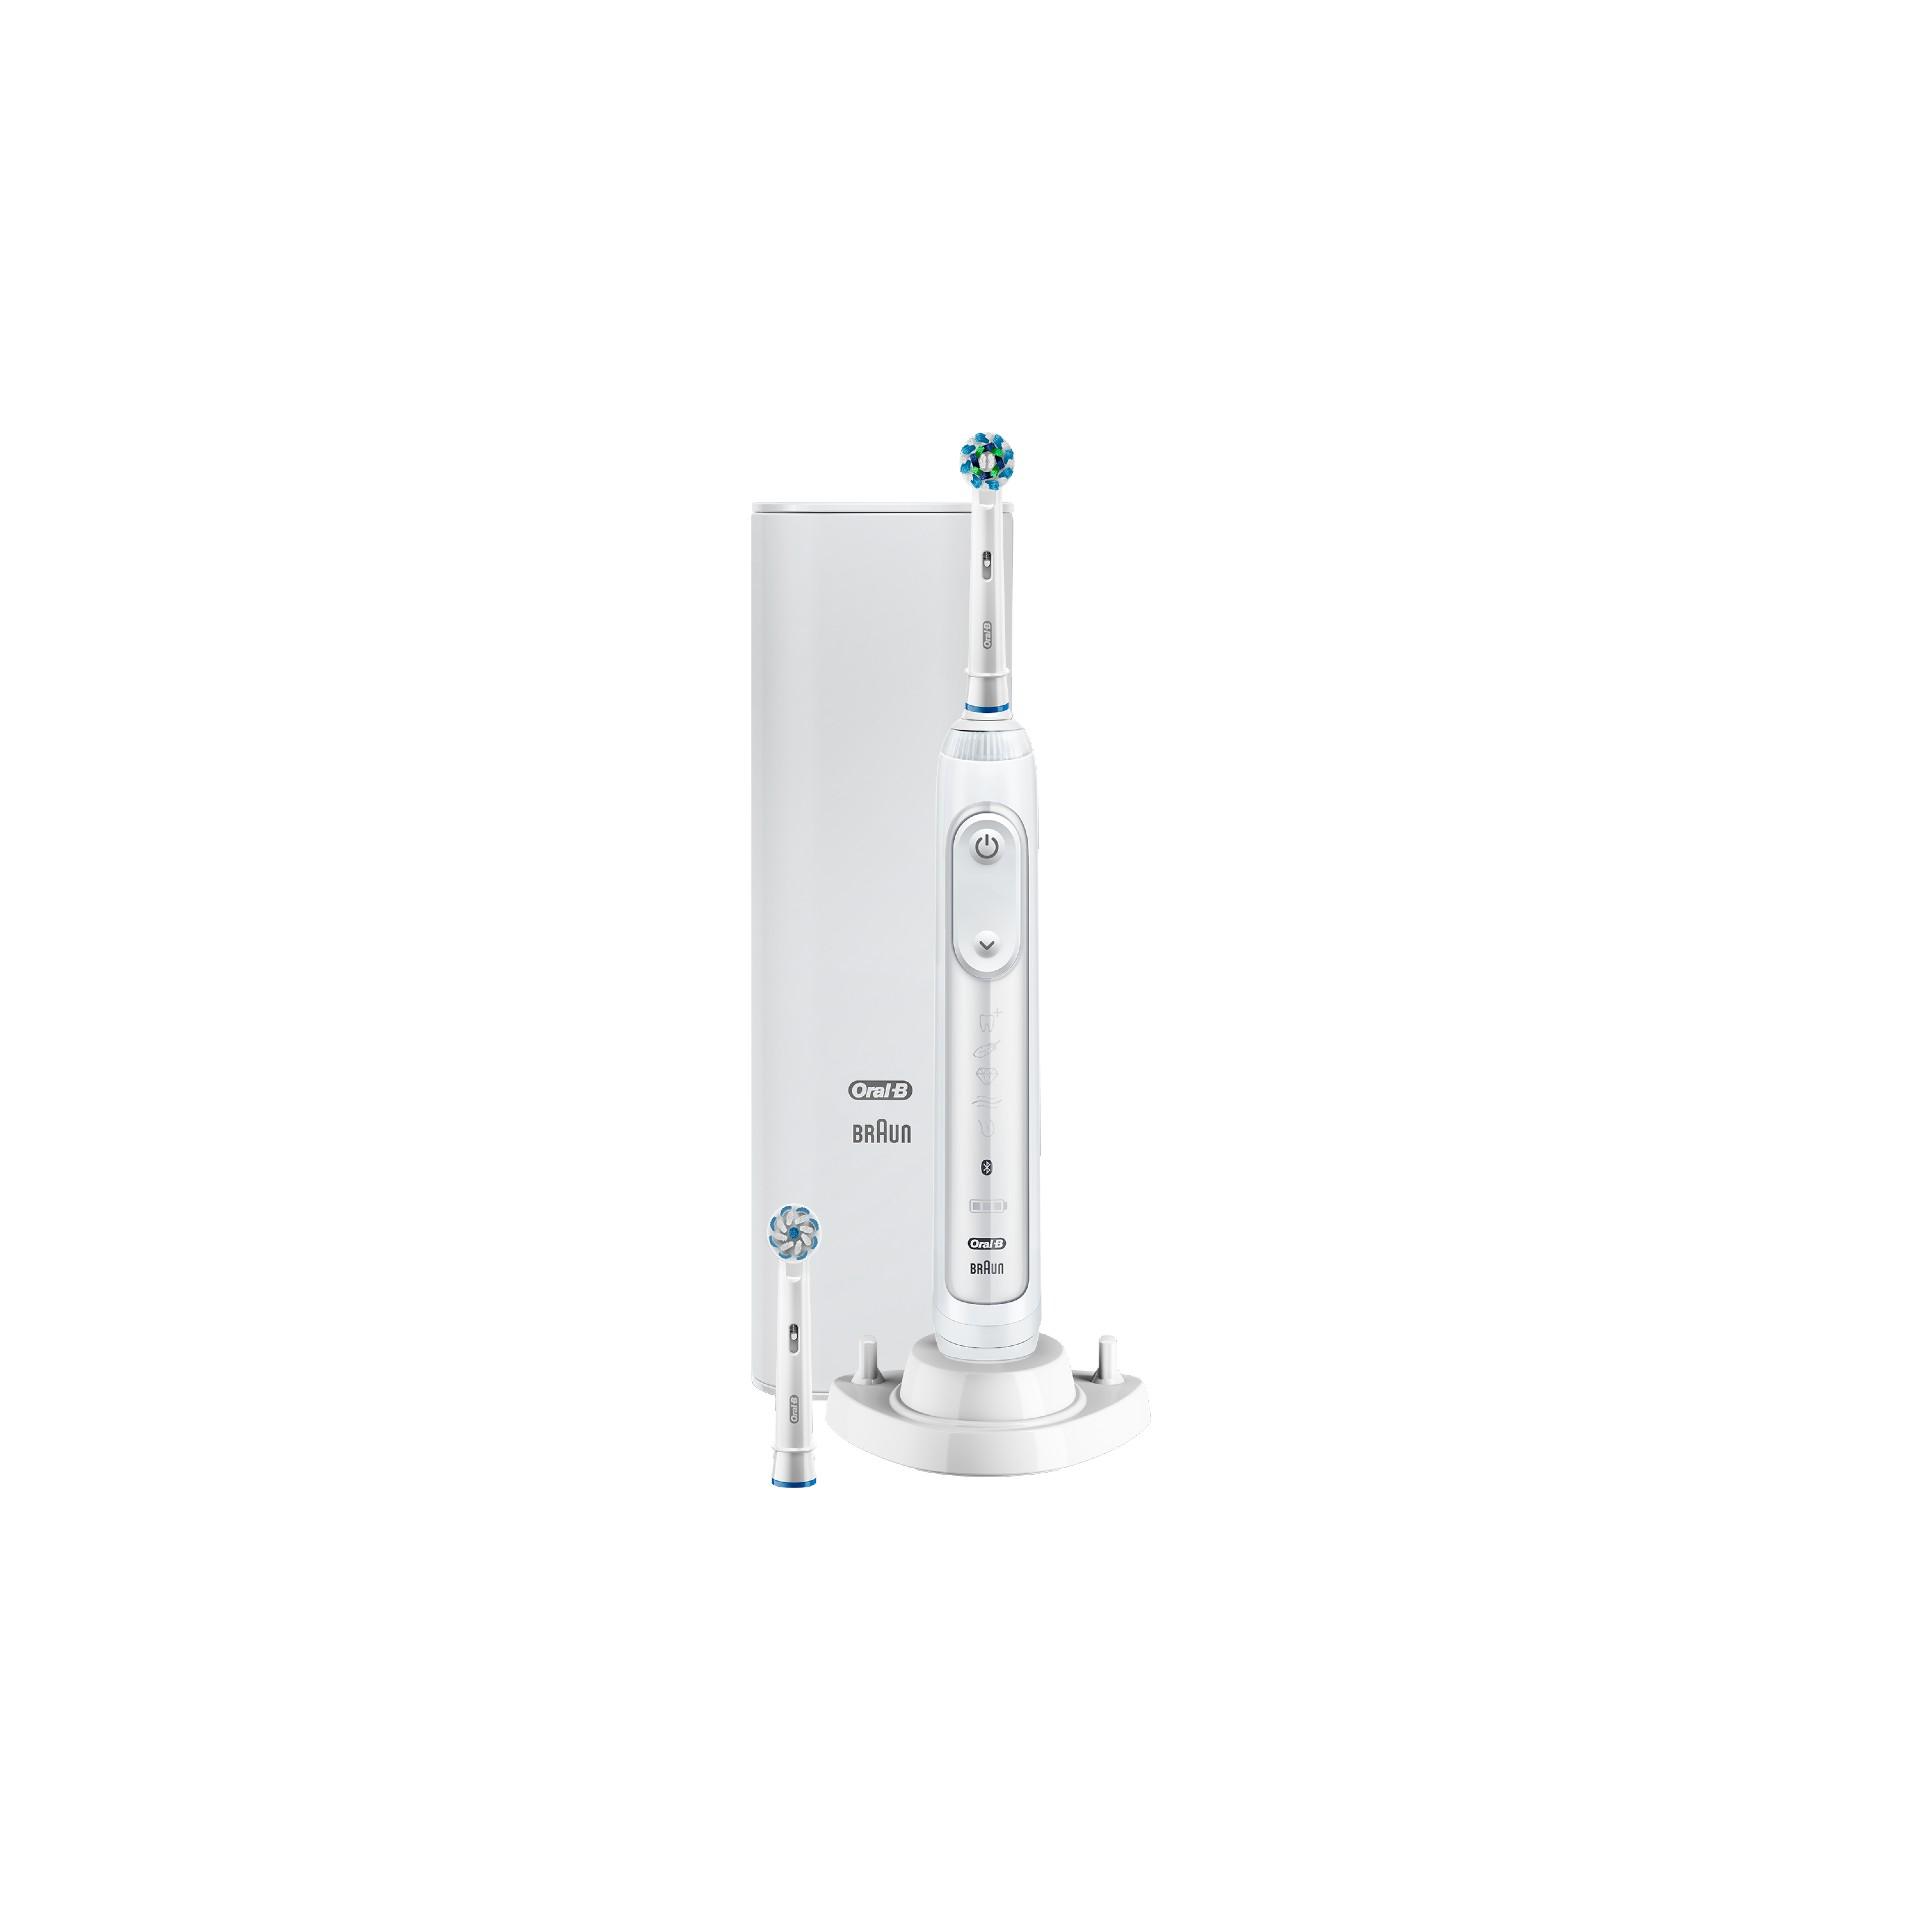 Oral-B 10200S genius eltandbørste, hvid